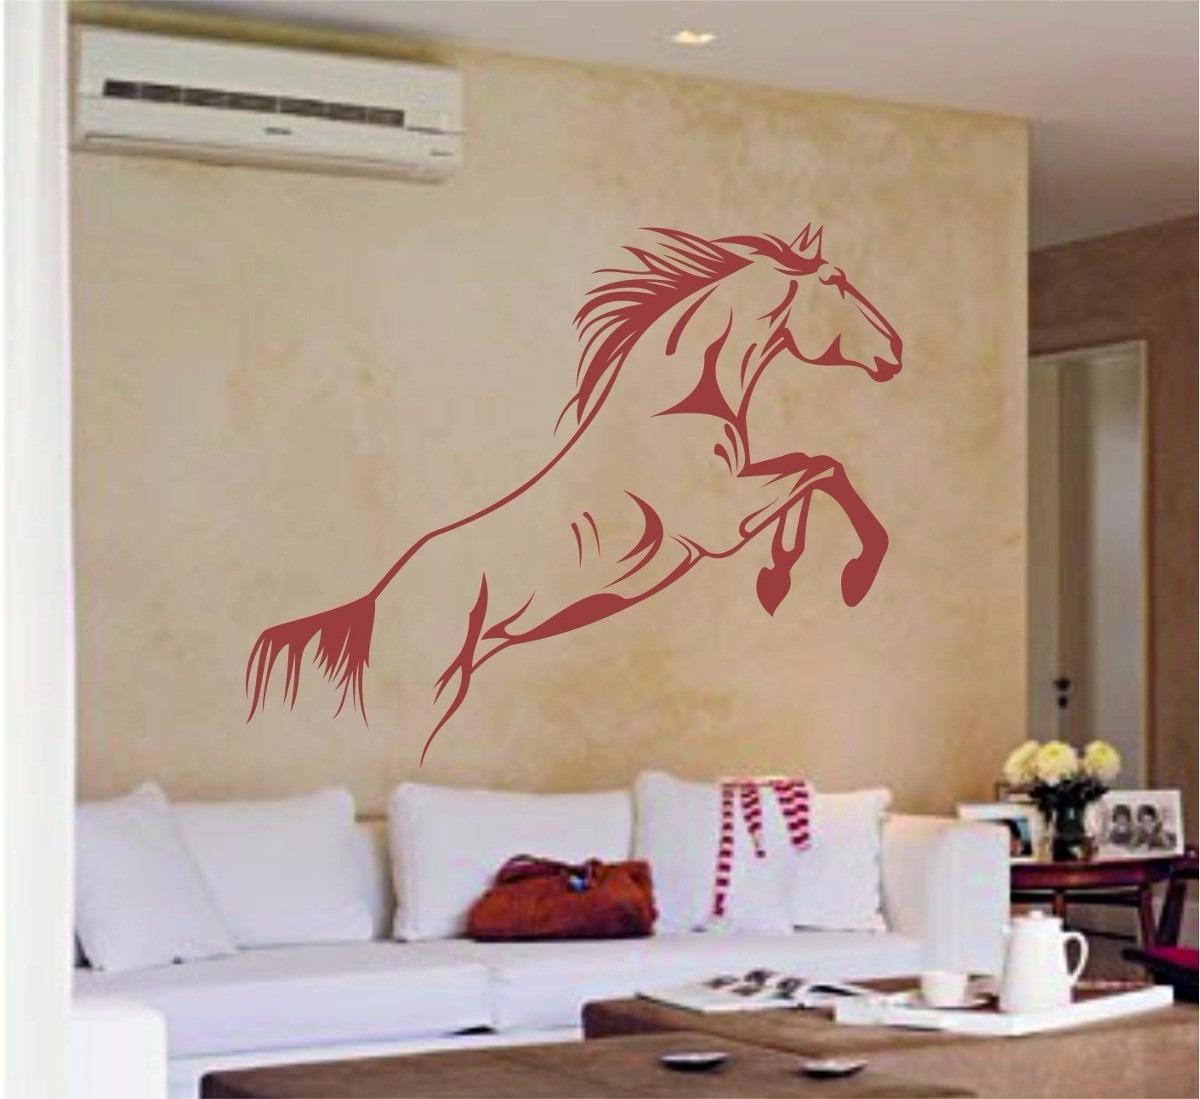 Vinilo caballo galopa decoracion de pared interiores for Decoracion paredes interiores